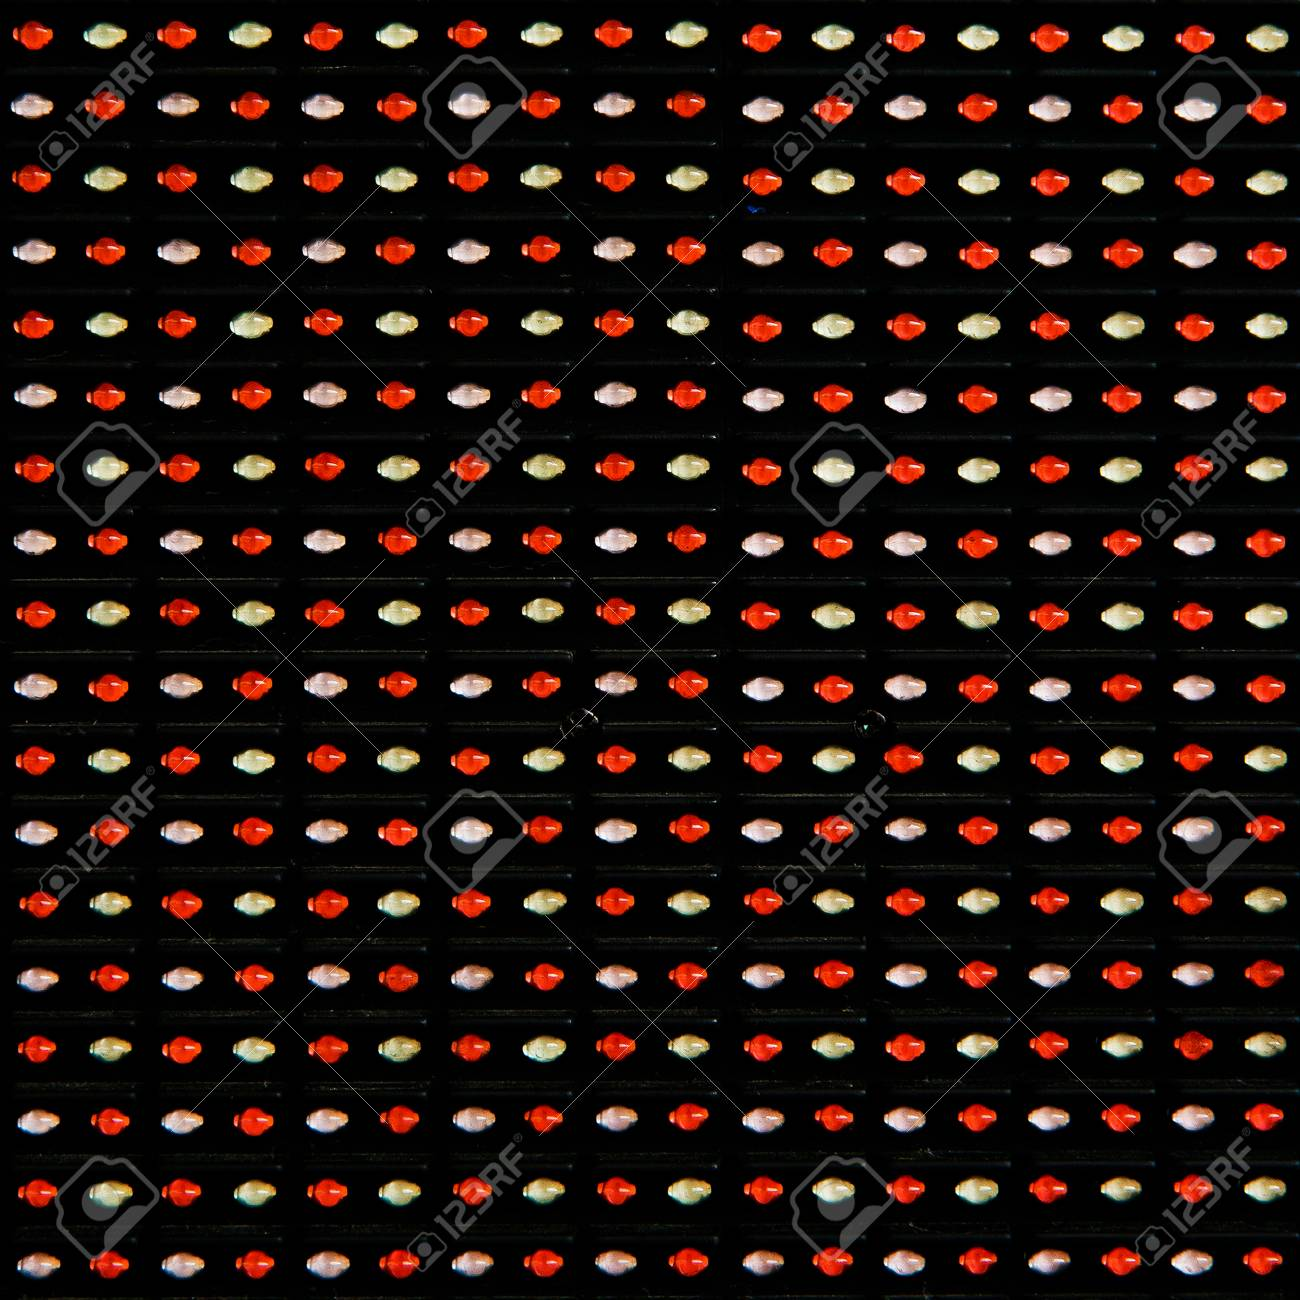 RGB led diode display panel  Selective focus  Shallow depth of